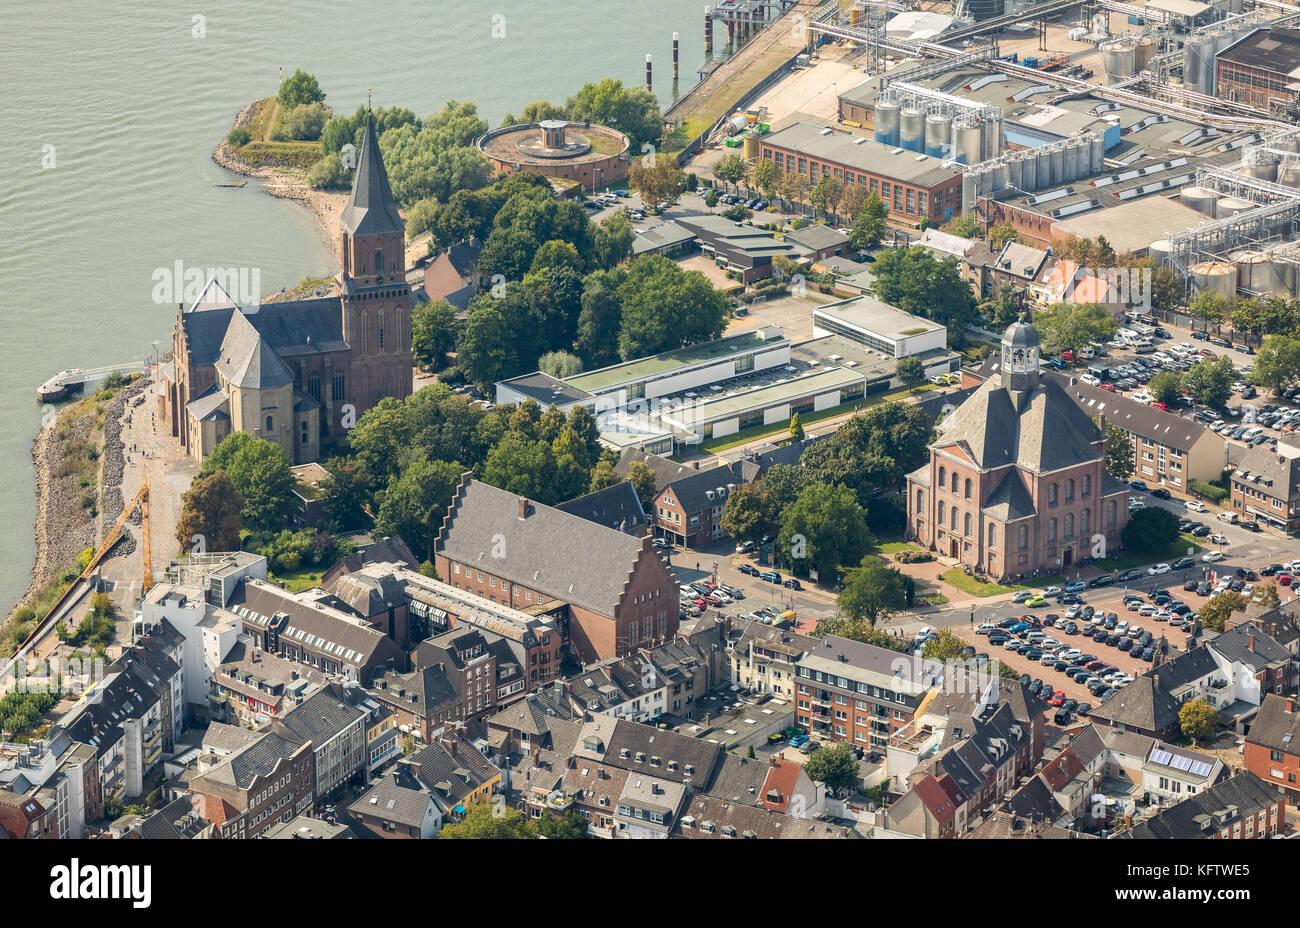 Stadtwerke energy suppliers, Emmerich - Ghost Market, Town Hall, St.Martini Emmerich, Emmerich, Lower Rhine, North - Stock Image